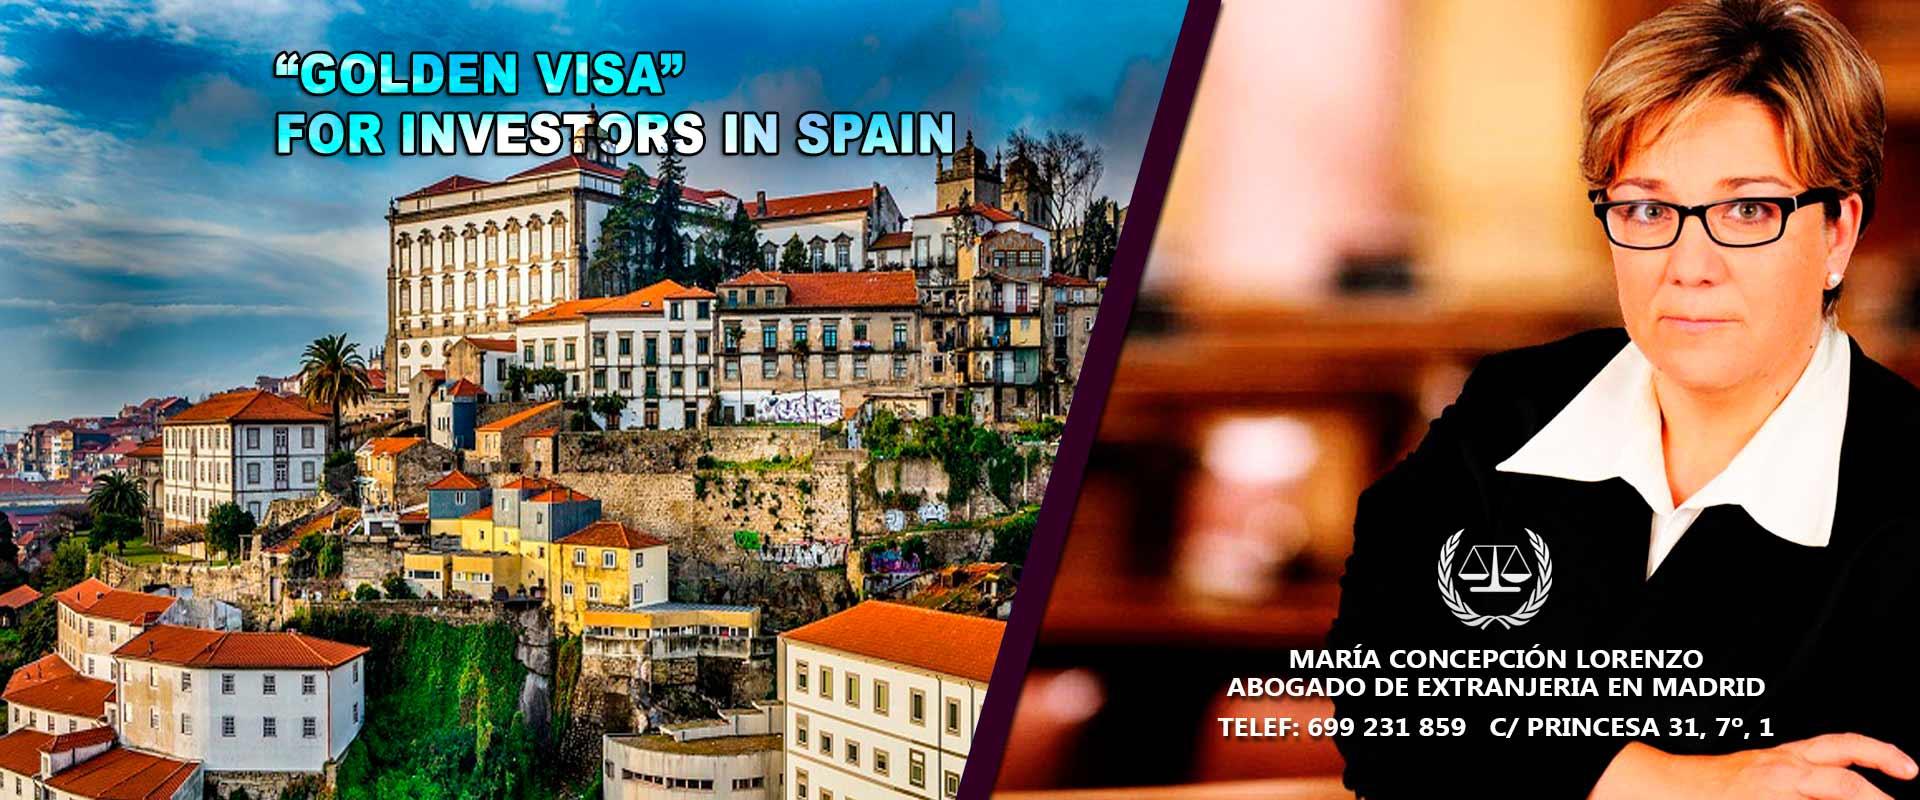 golden visa for investors in spain